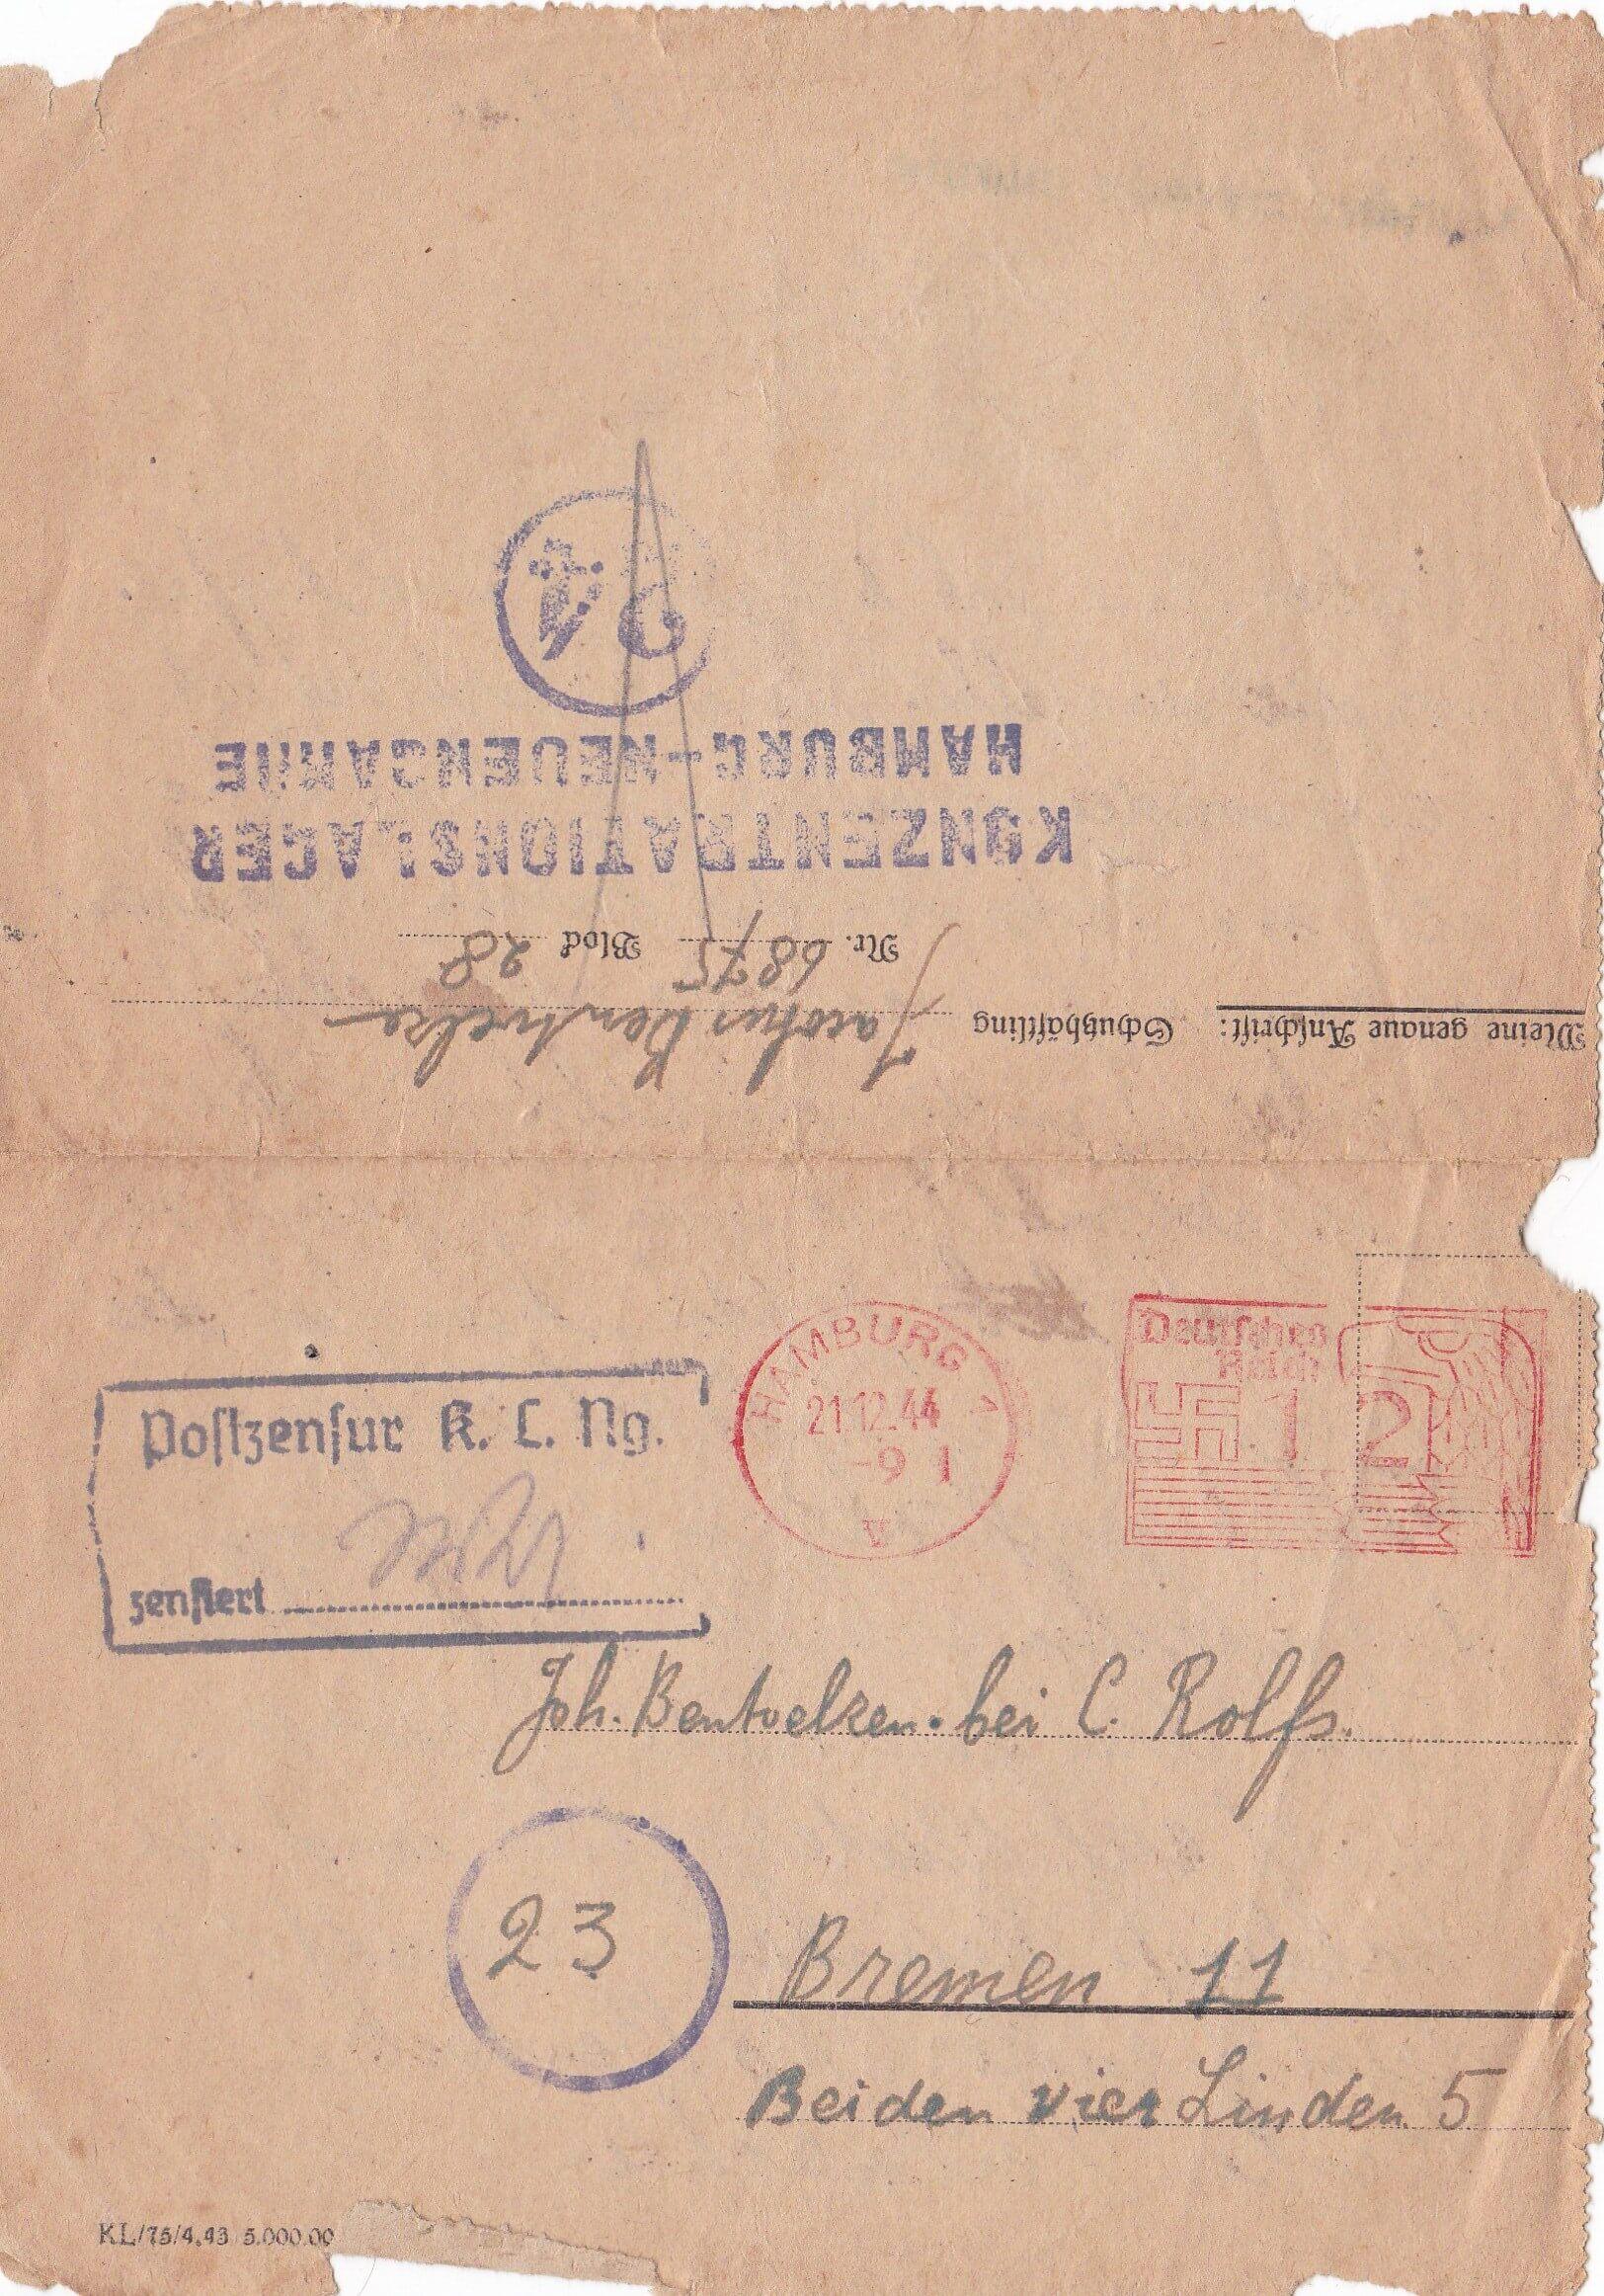 Concentratiekamp brieven Neuengamme